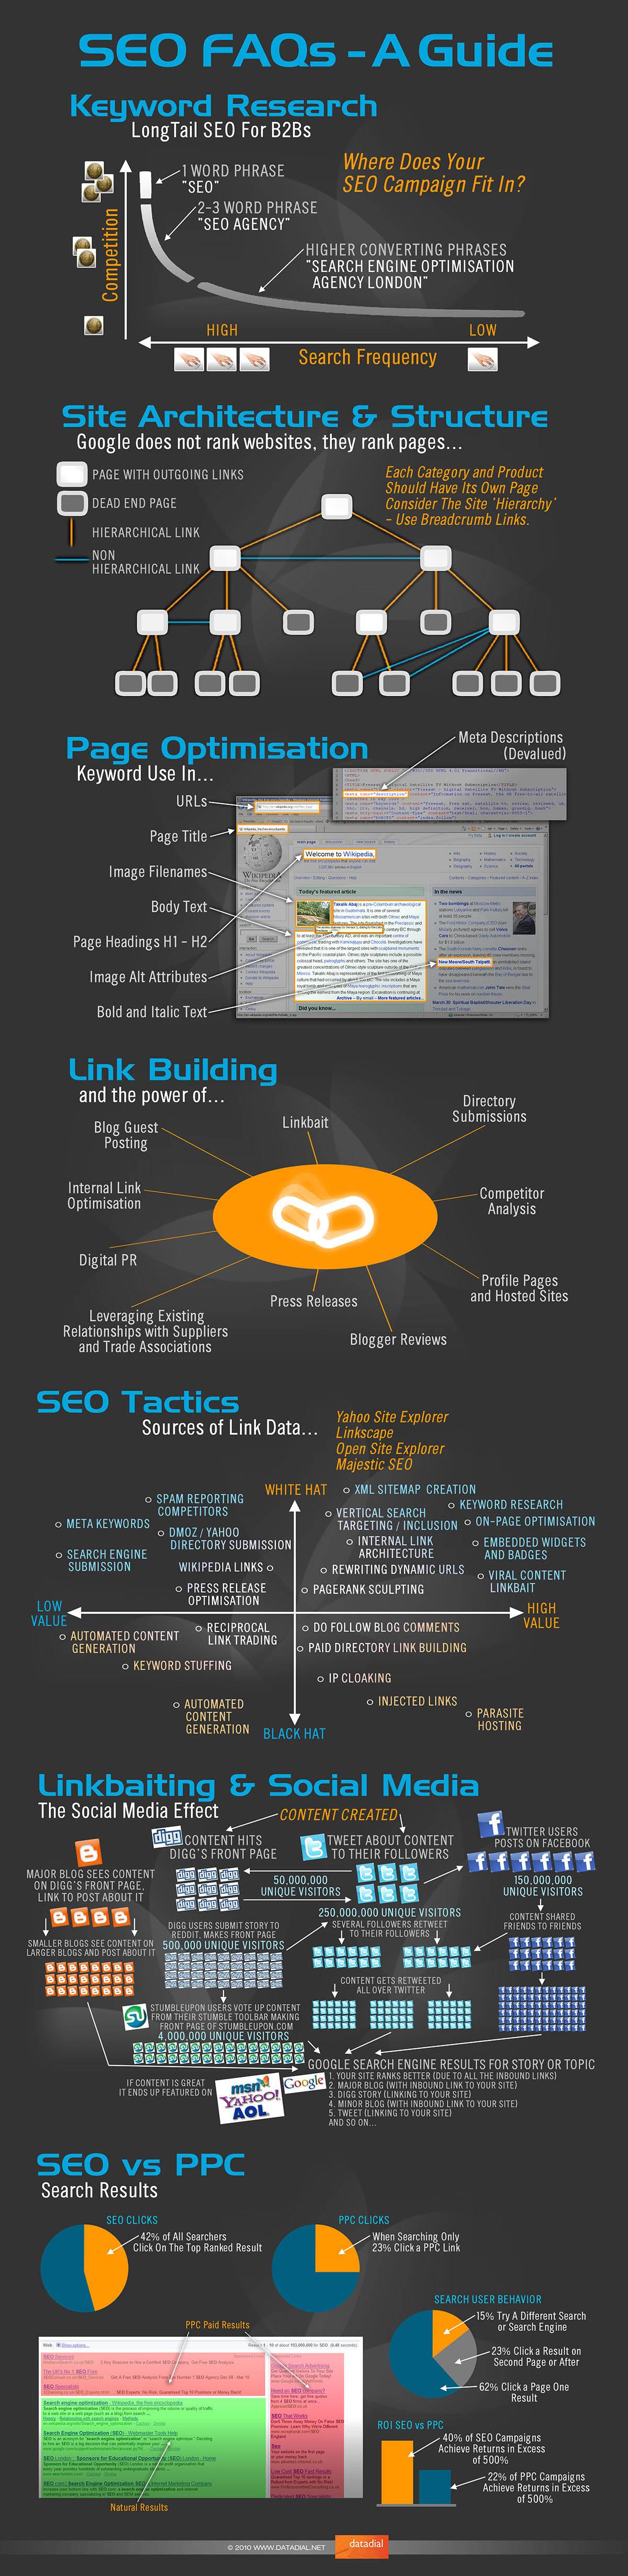 infografia-posicionamiento-en-buscadores